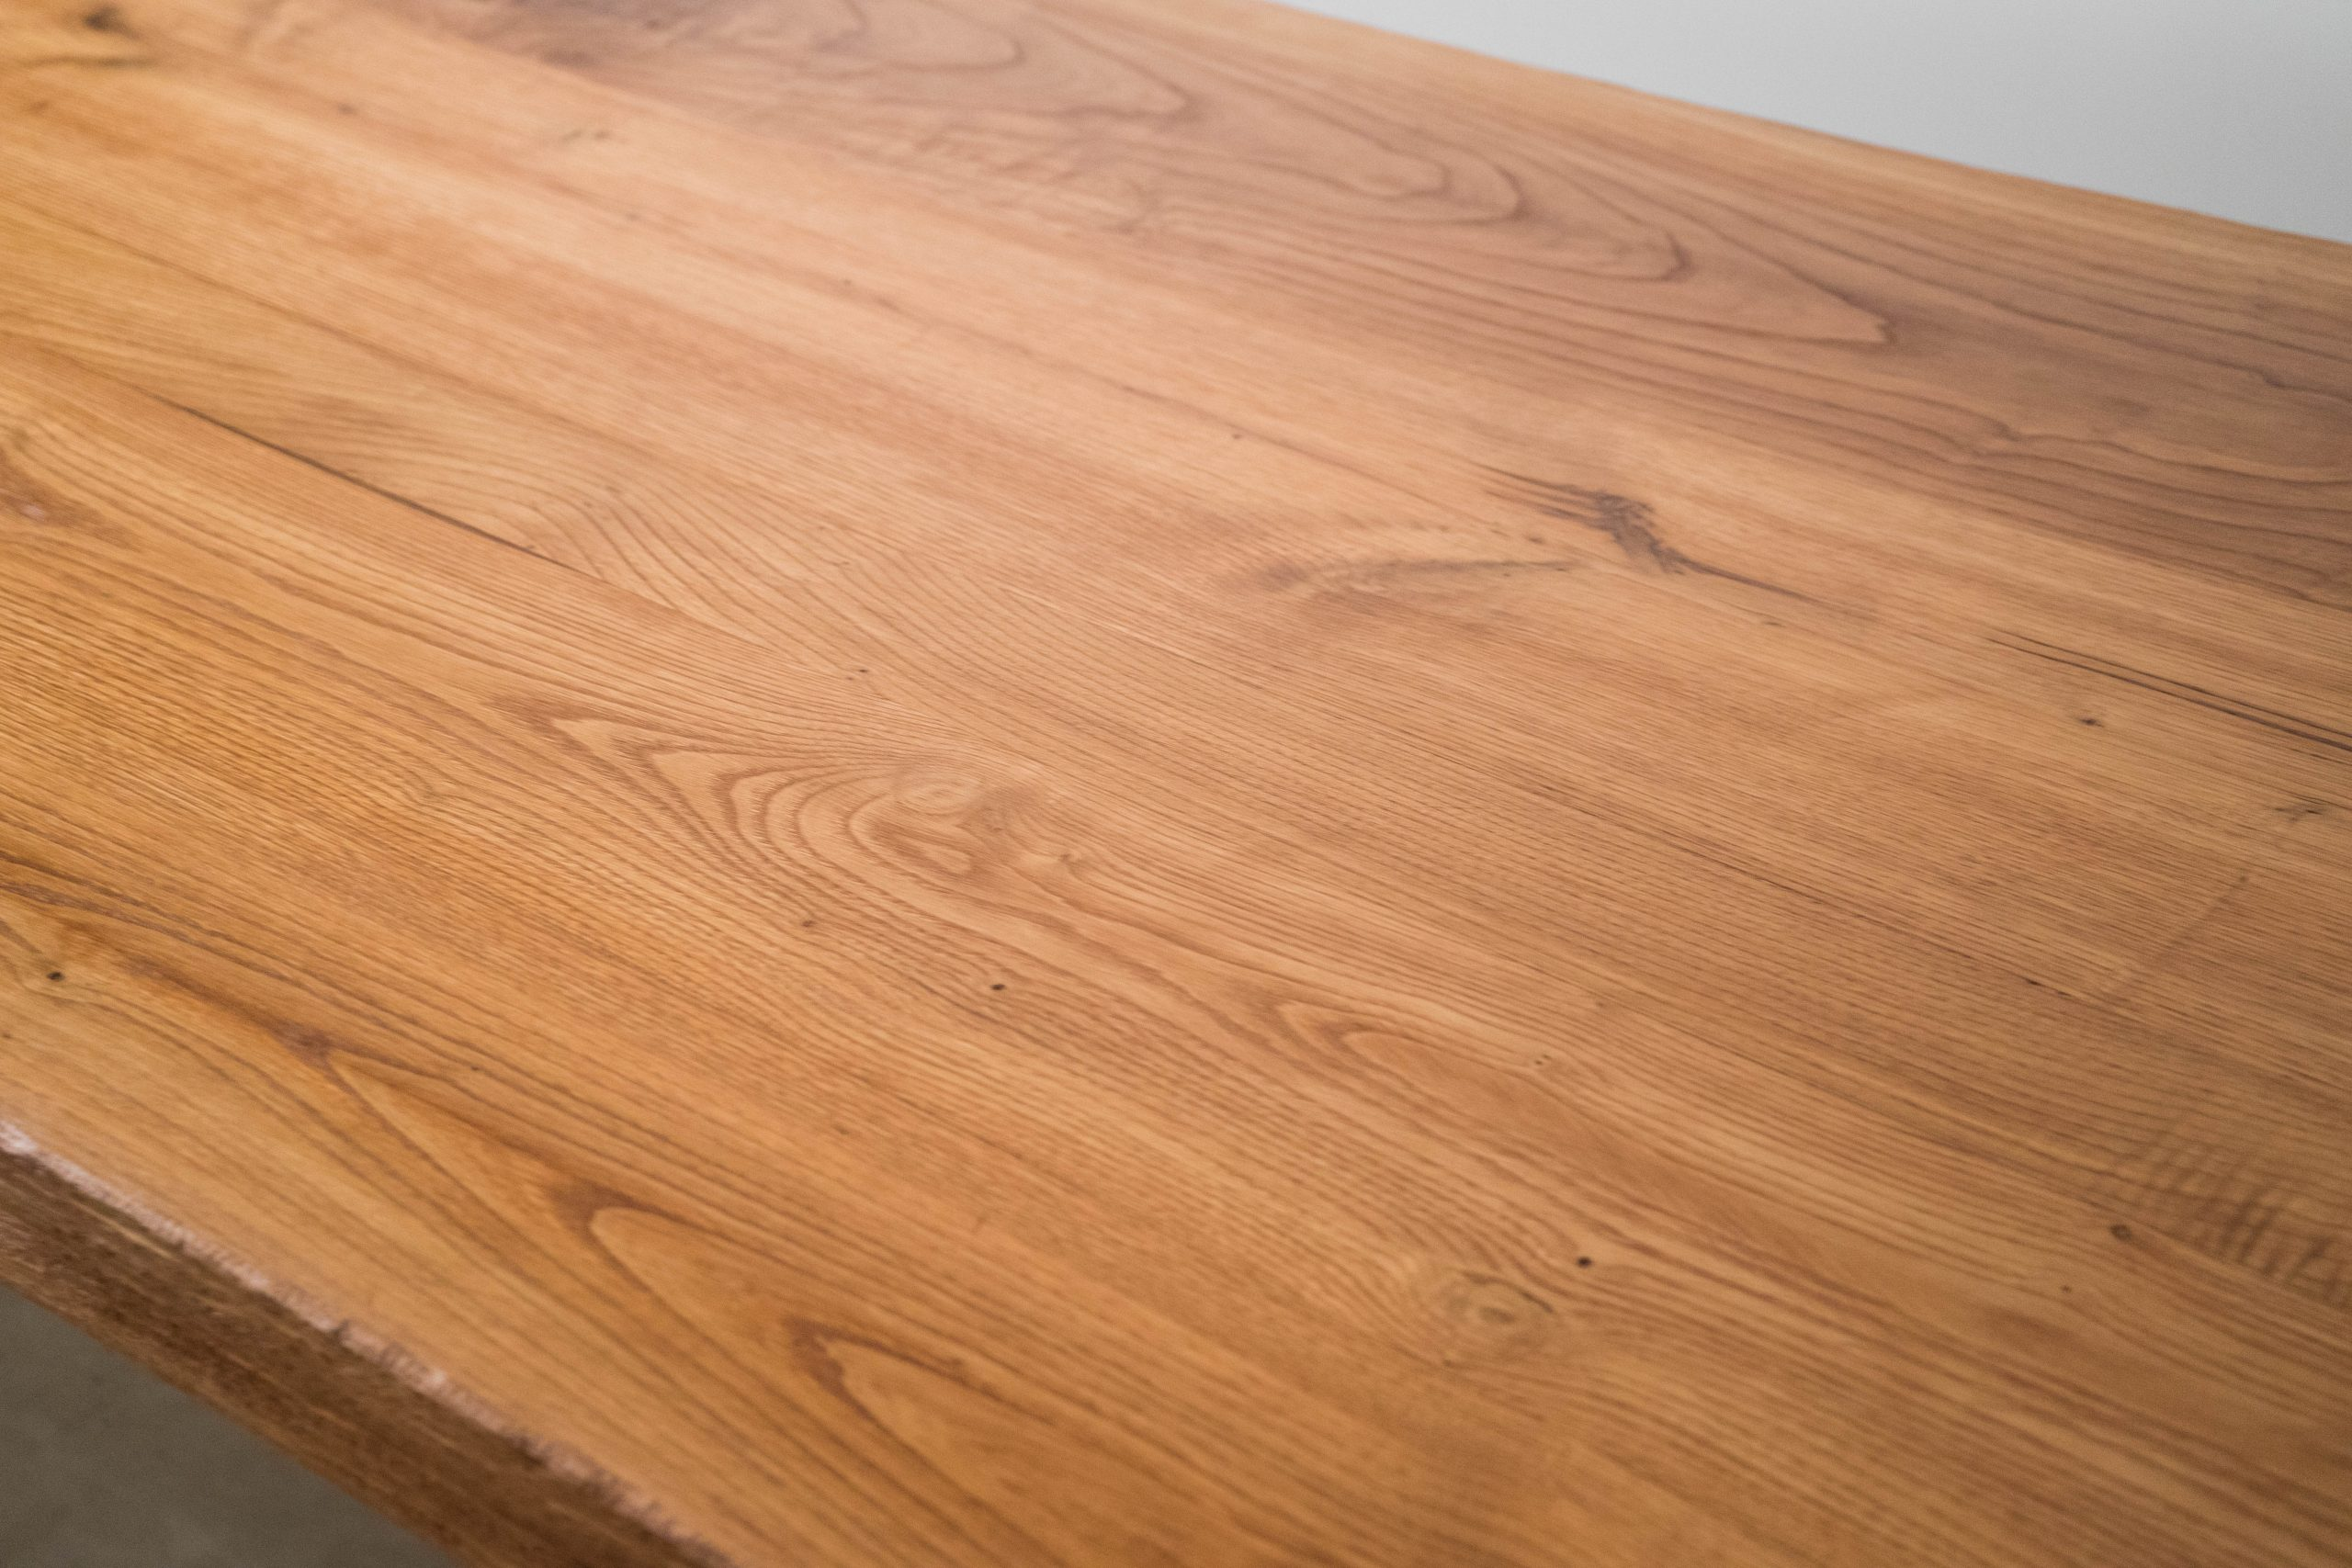 sobre de madera envejecida tablero de madera maciza